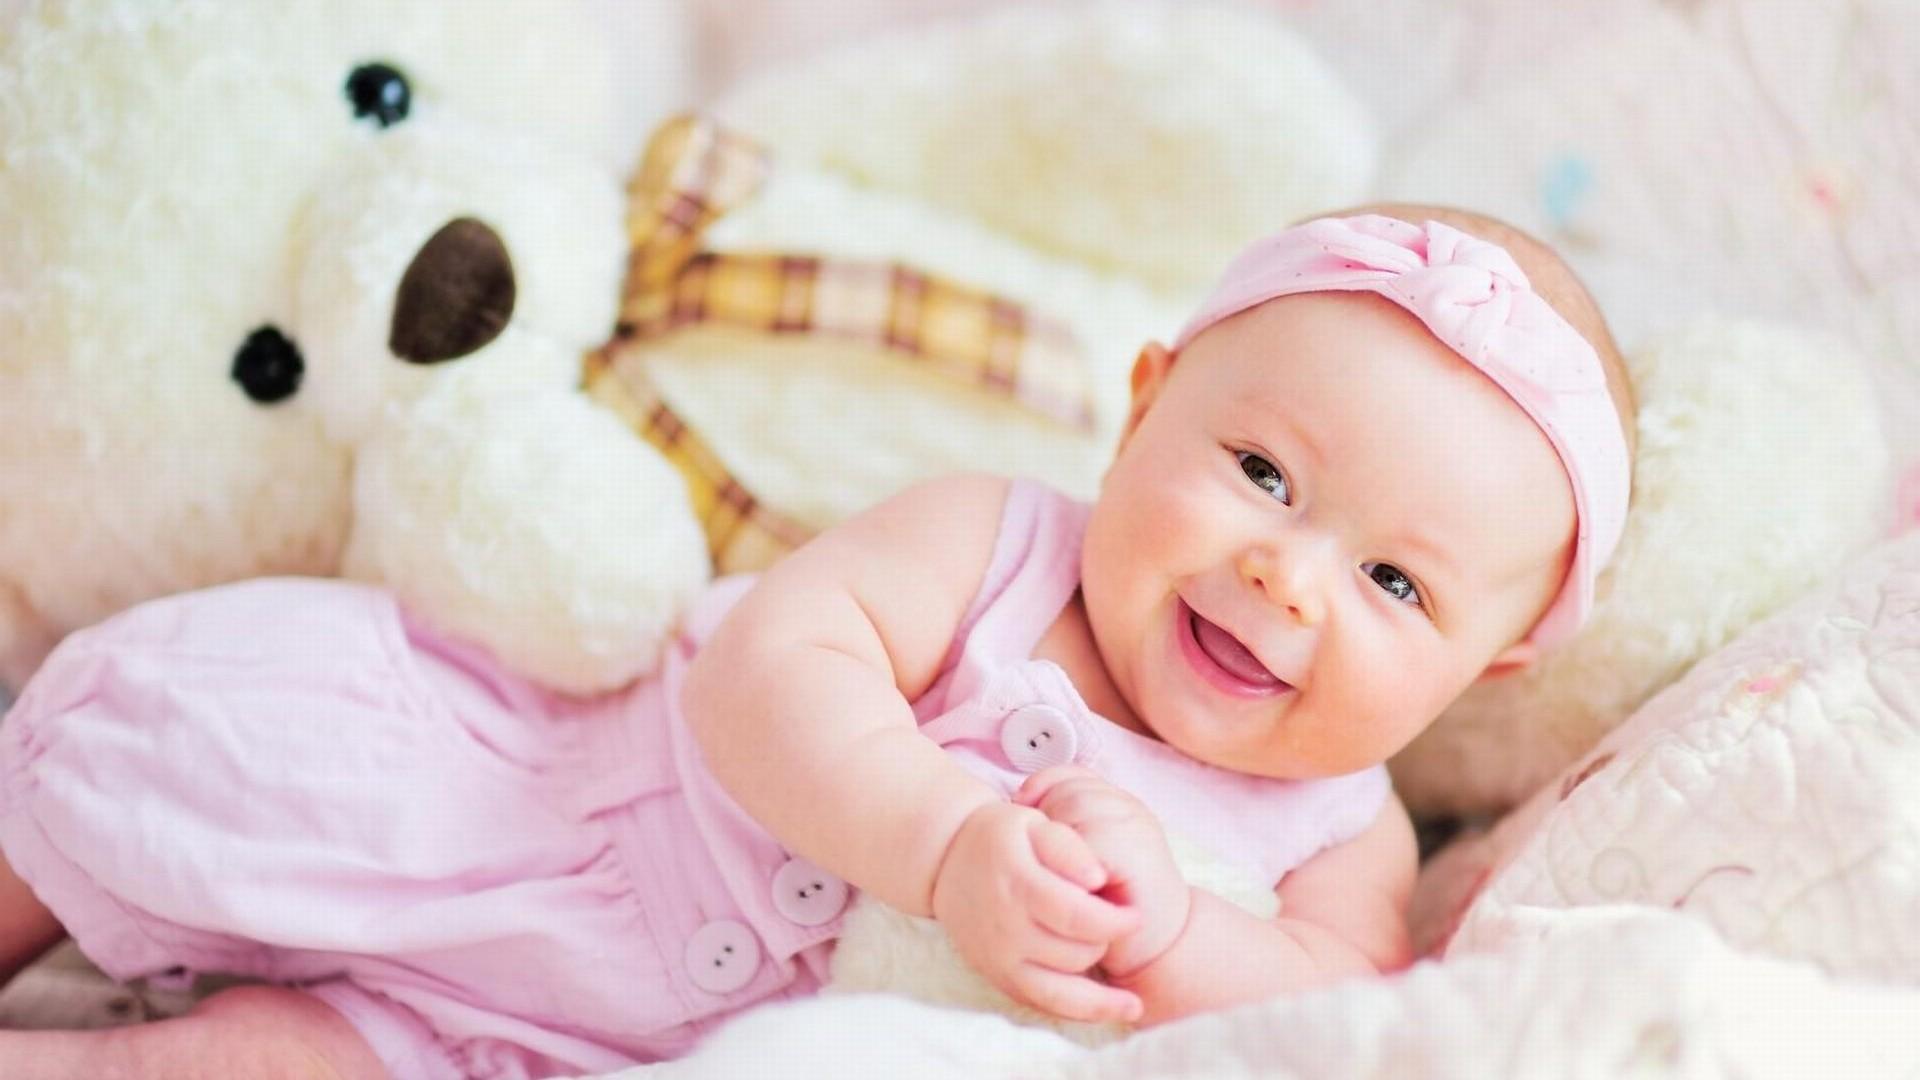 Smiling Baby Girl Desktop Wallpapers